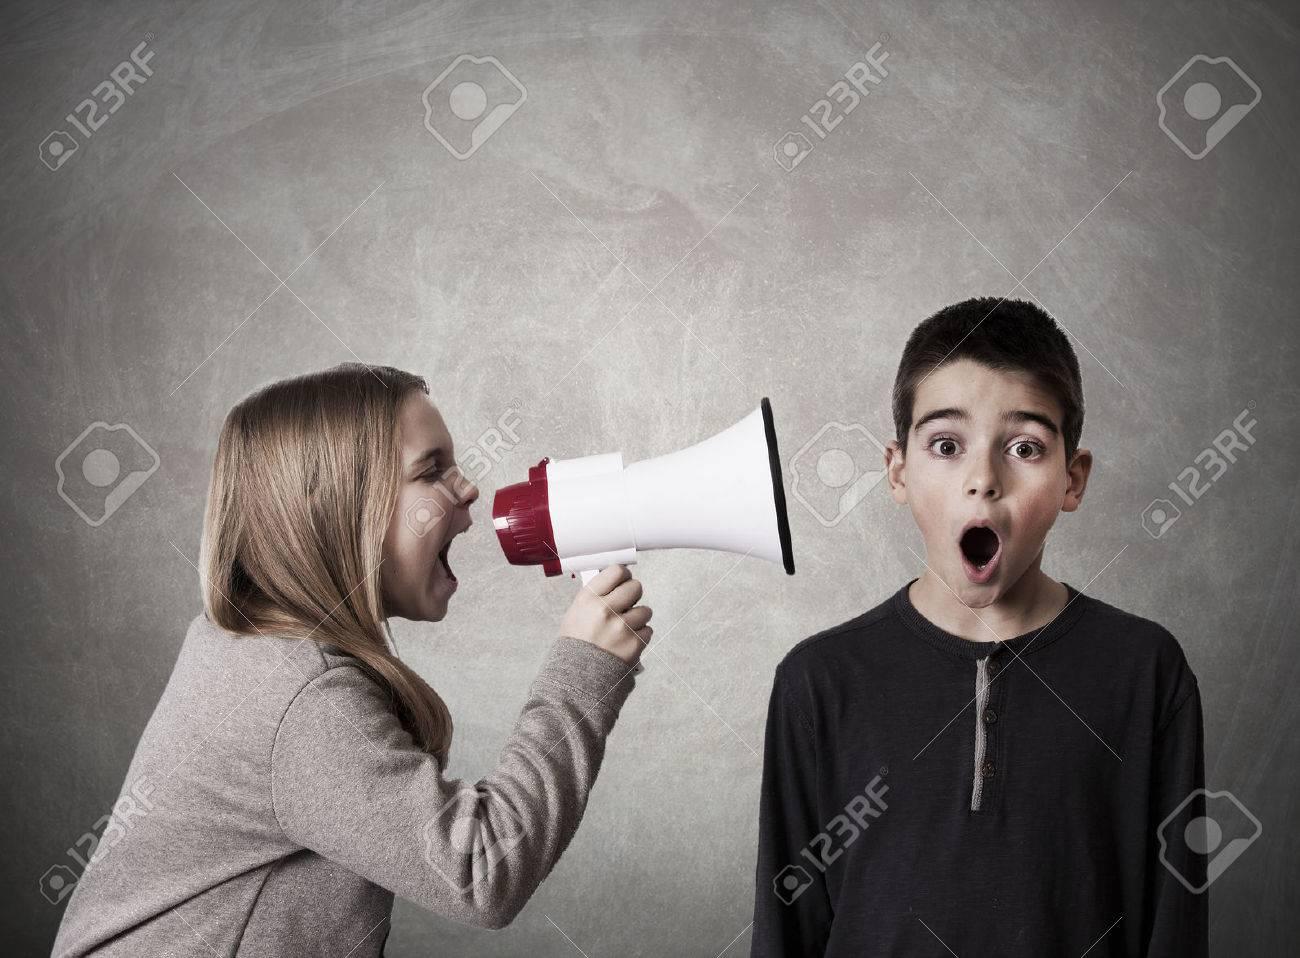 child with speaker - 36128578